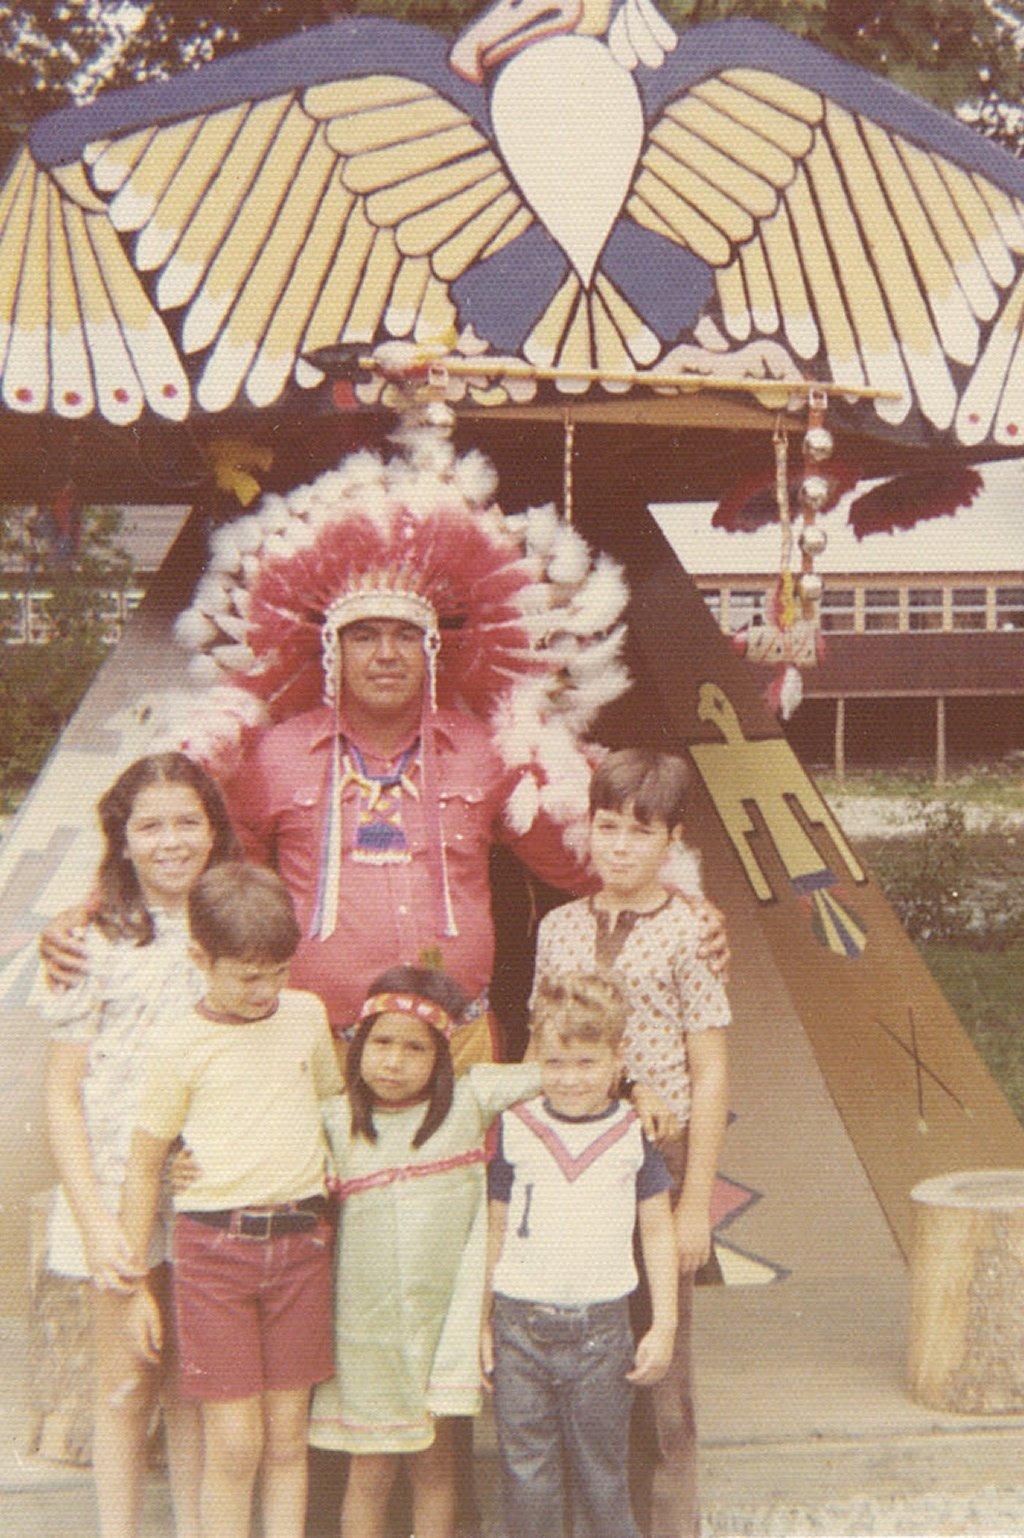 Smoky Mountains Family Vacation, 1975